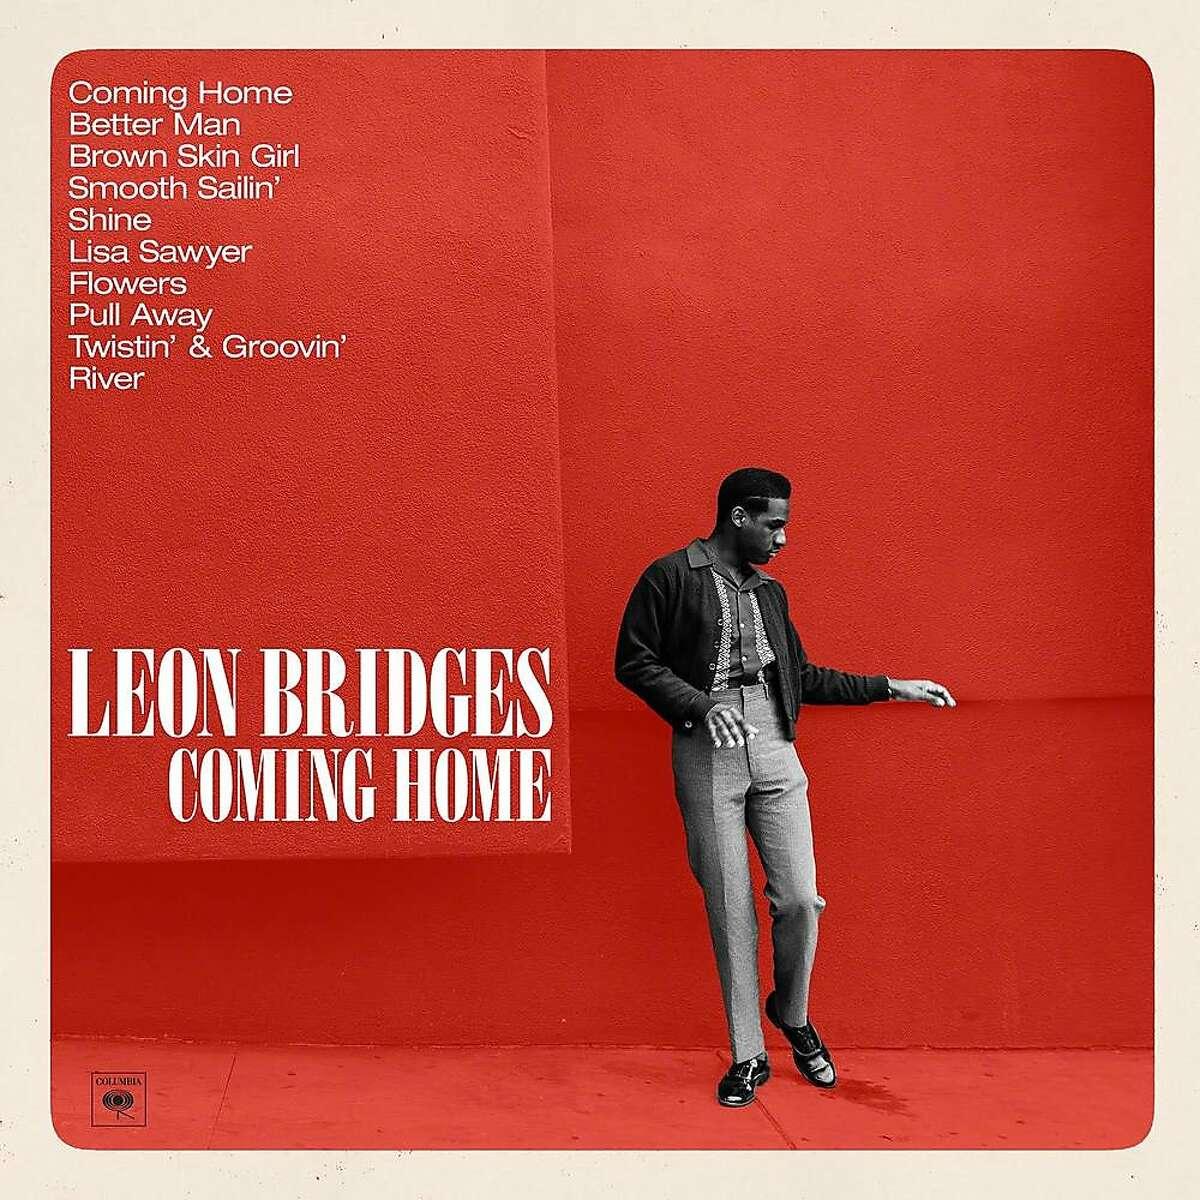 Leon Bridges, 'Coming Home'